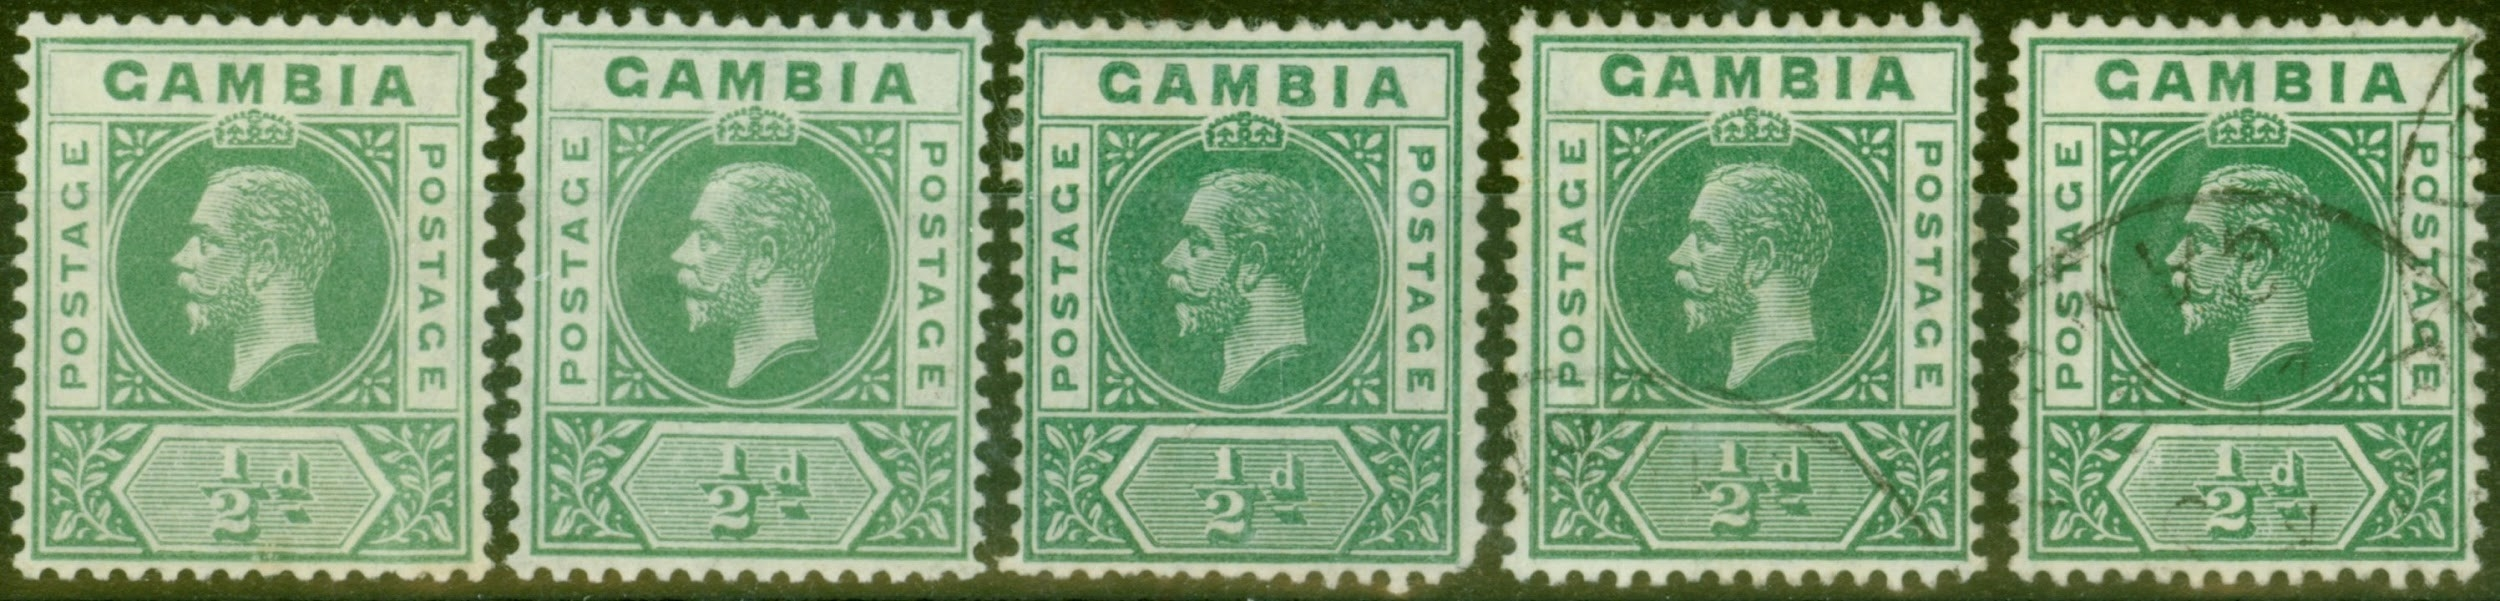 Stamp Error Gambia KGV Deformed B